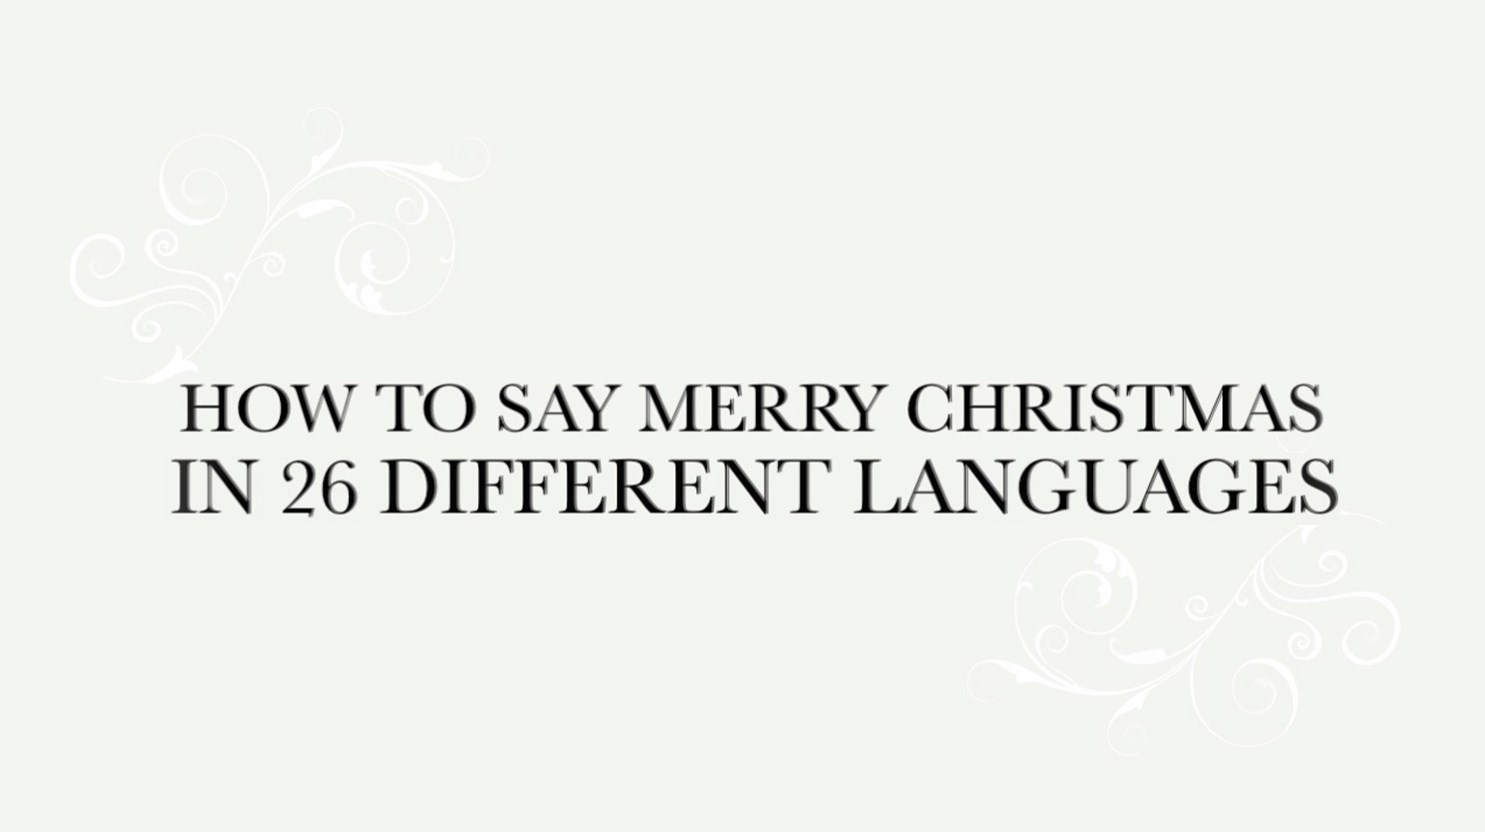 merry christmas - How To Say Merry Christmas